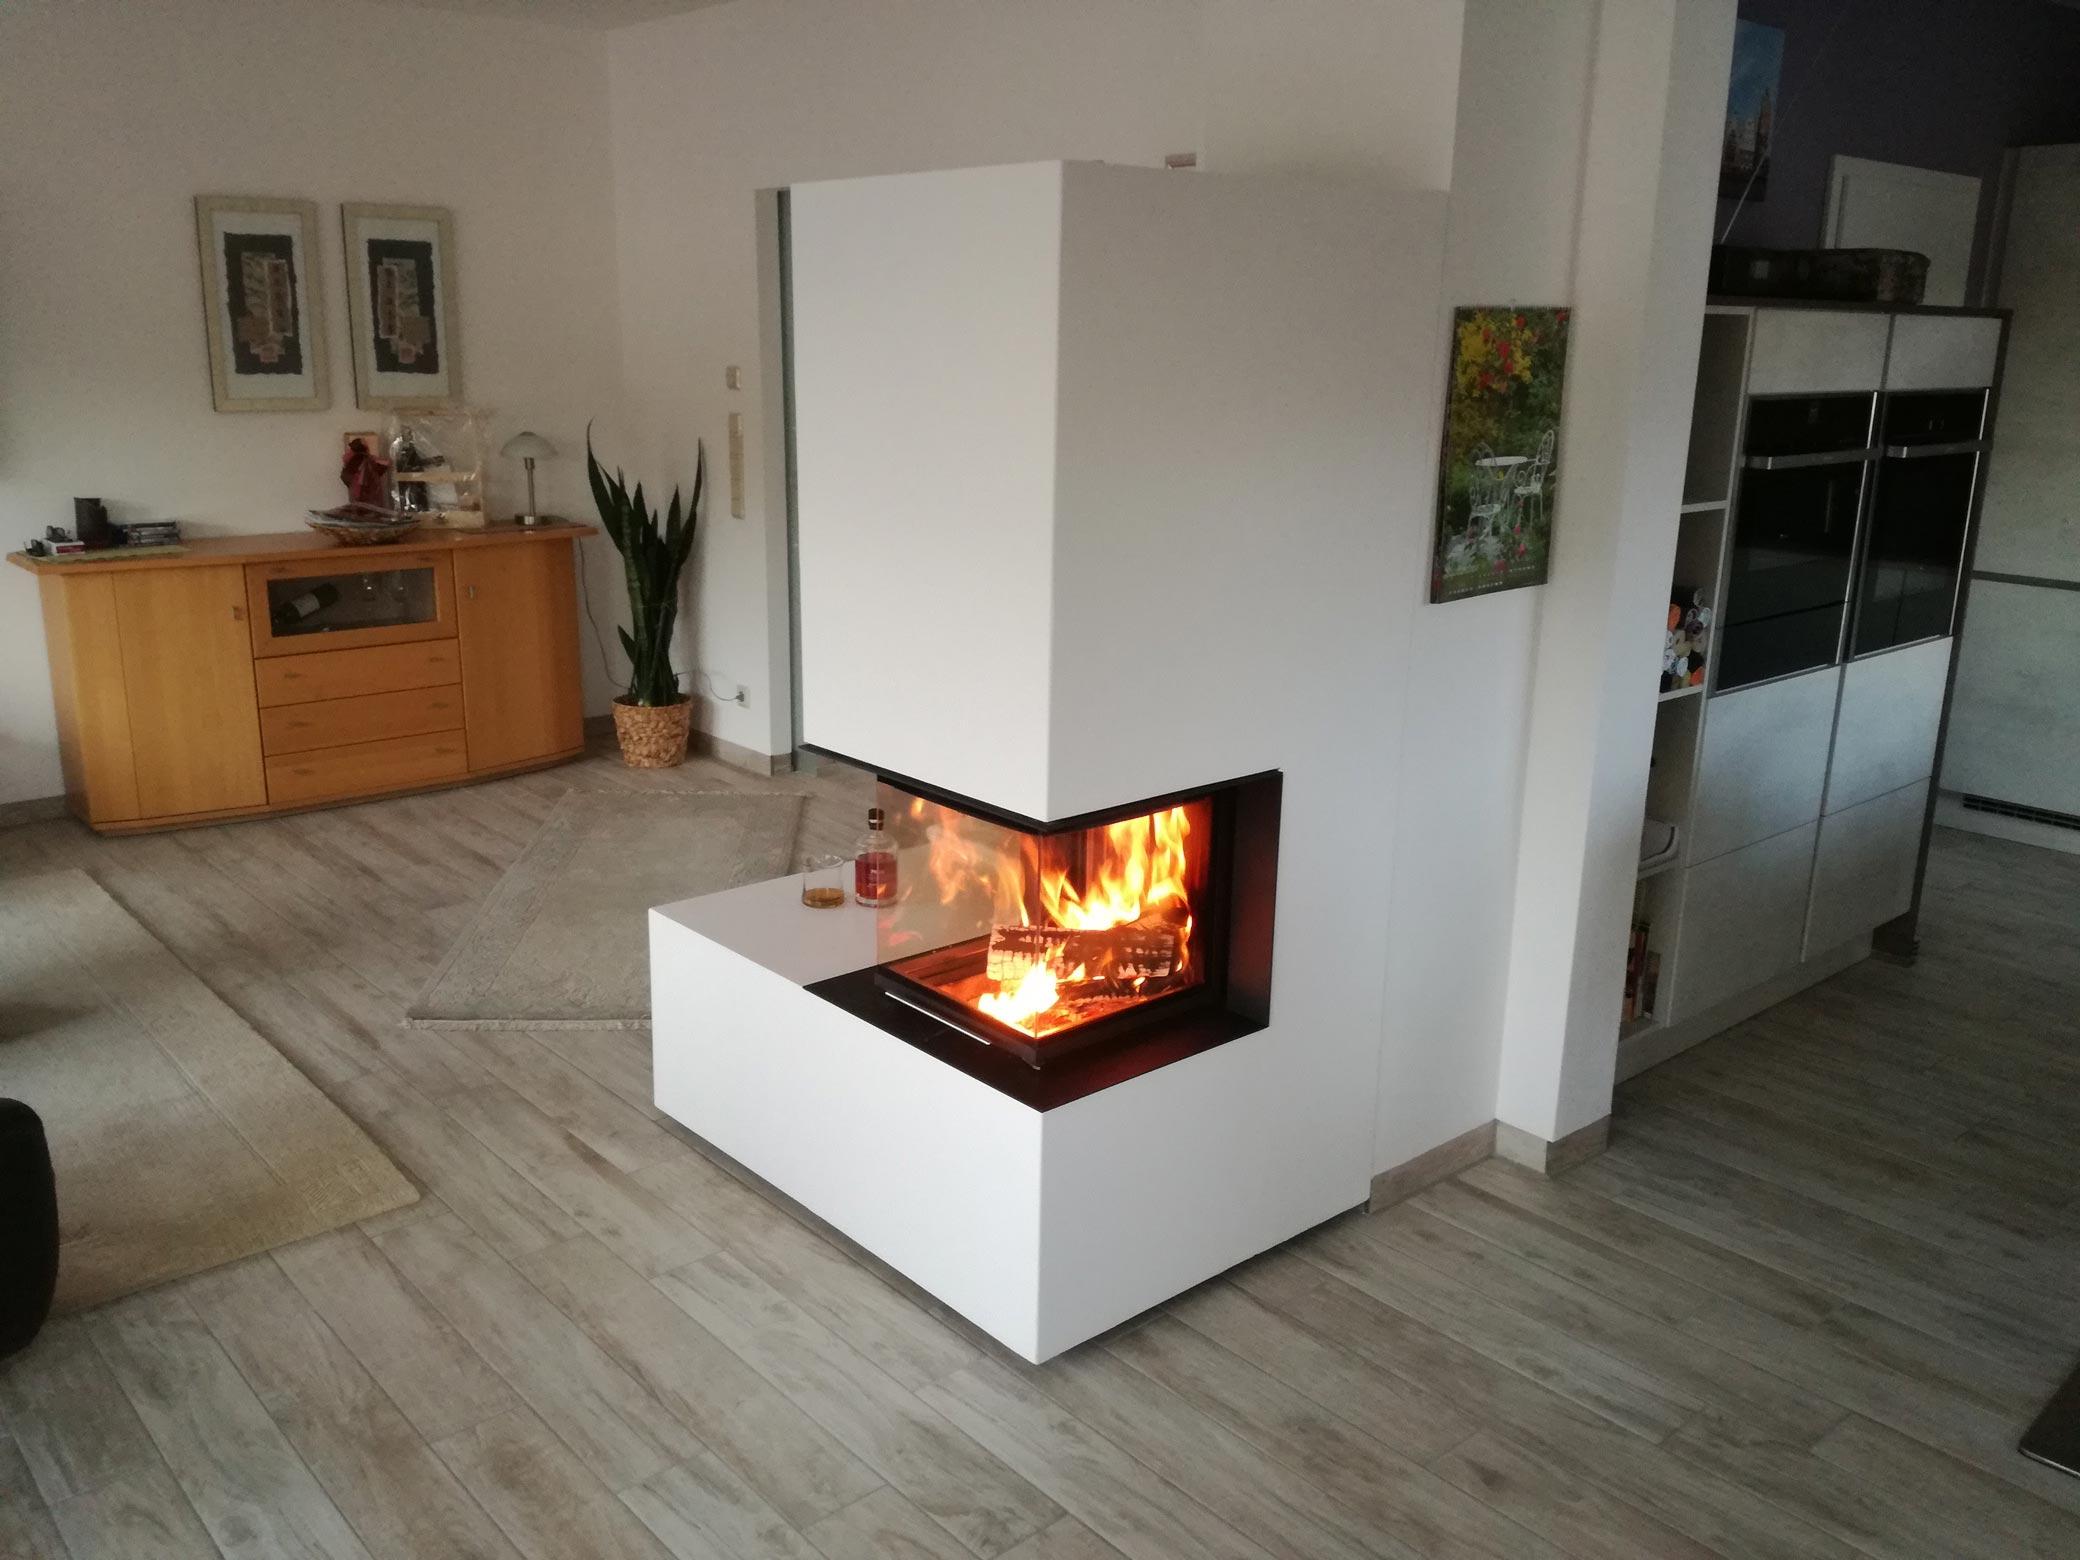 Kaminbausatz Brunner Systemkamin Bsk 10 Panorama Kamin Schiebetur 8 Kw Kaufen Cafiro